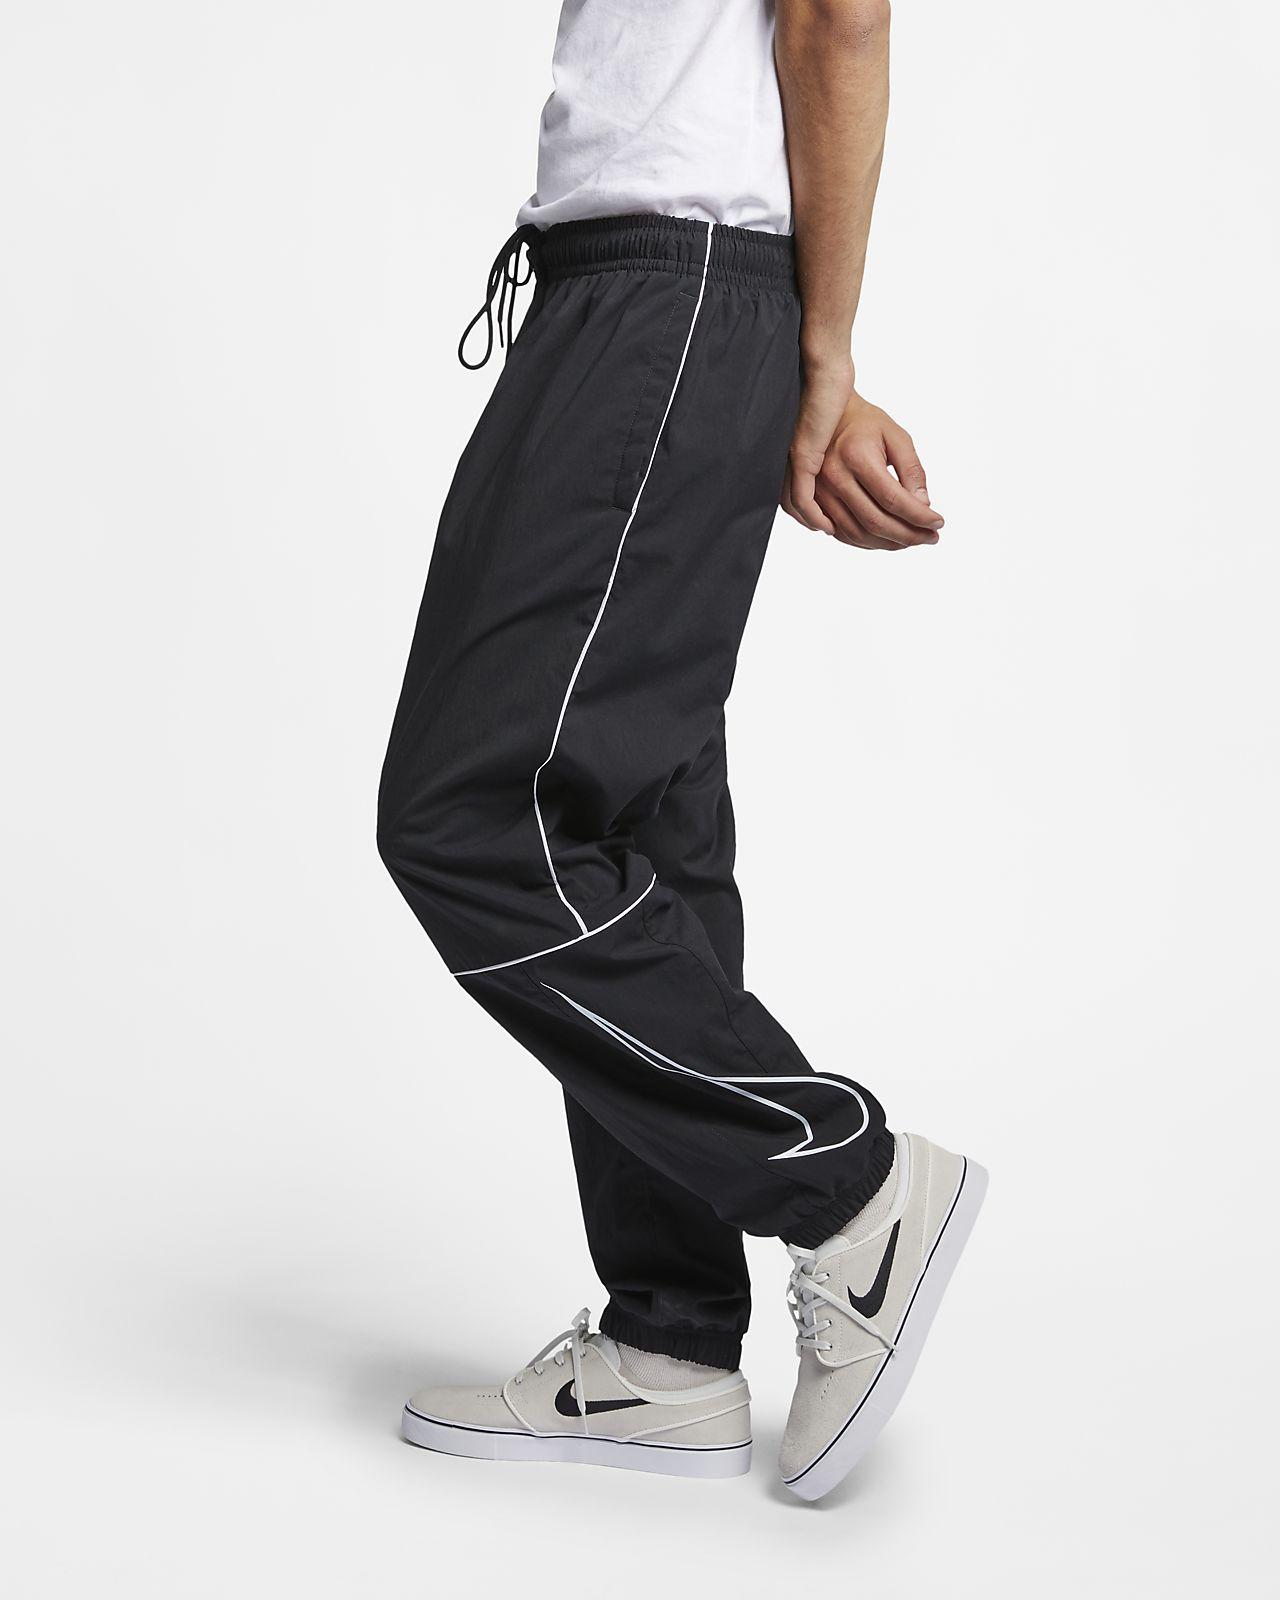 Nike SB Swoosh 男子滑板长裤